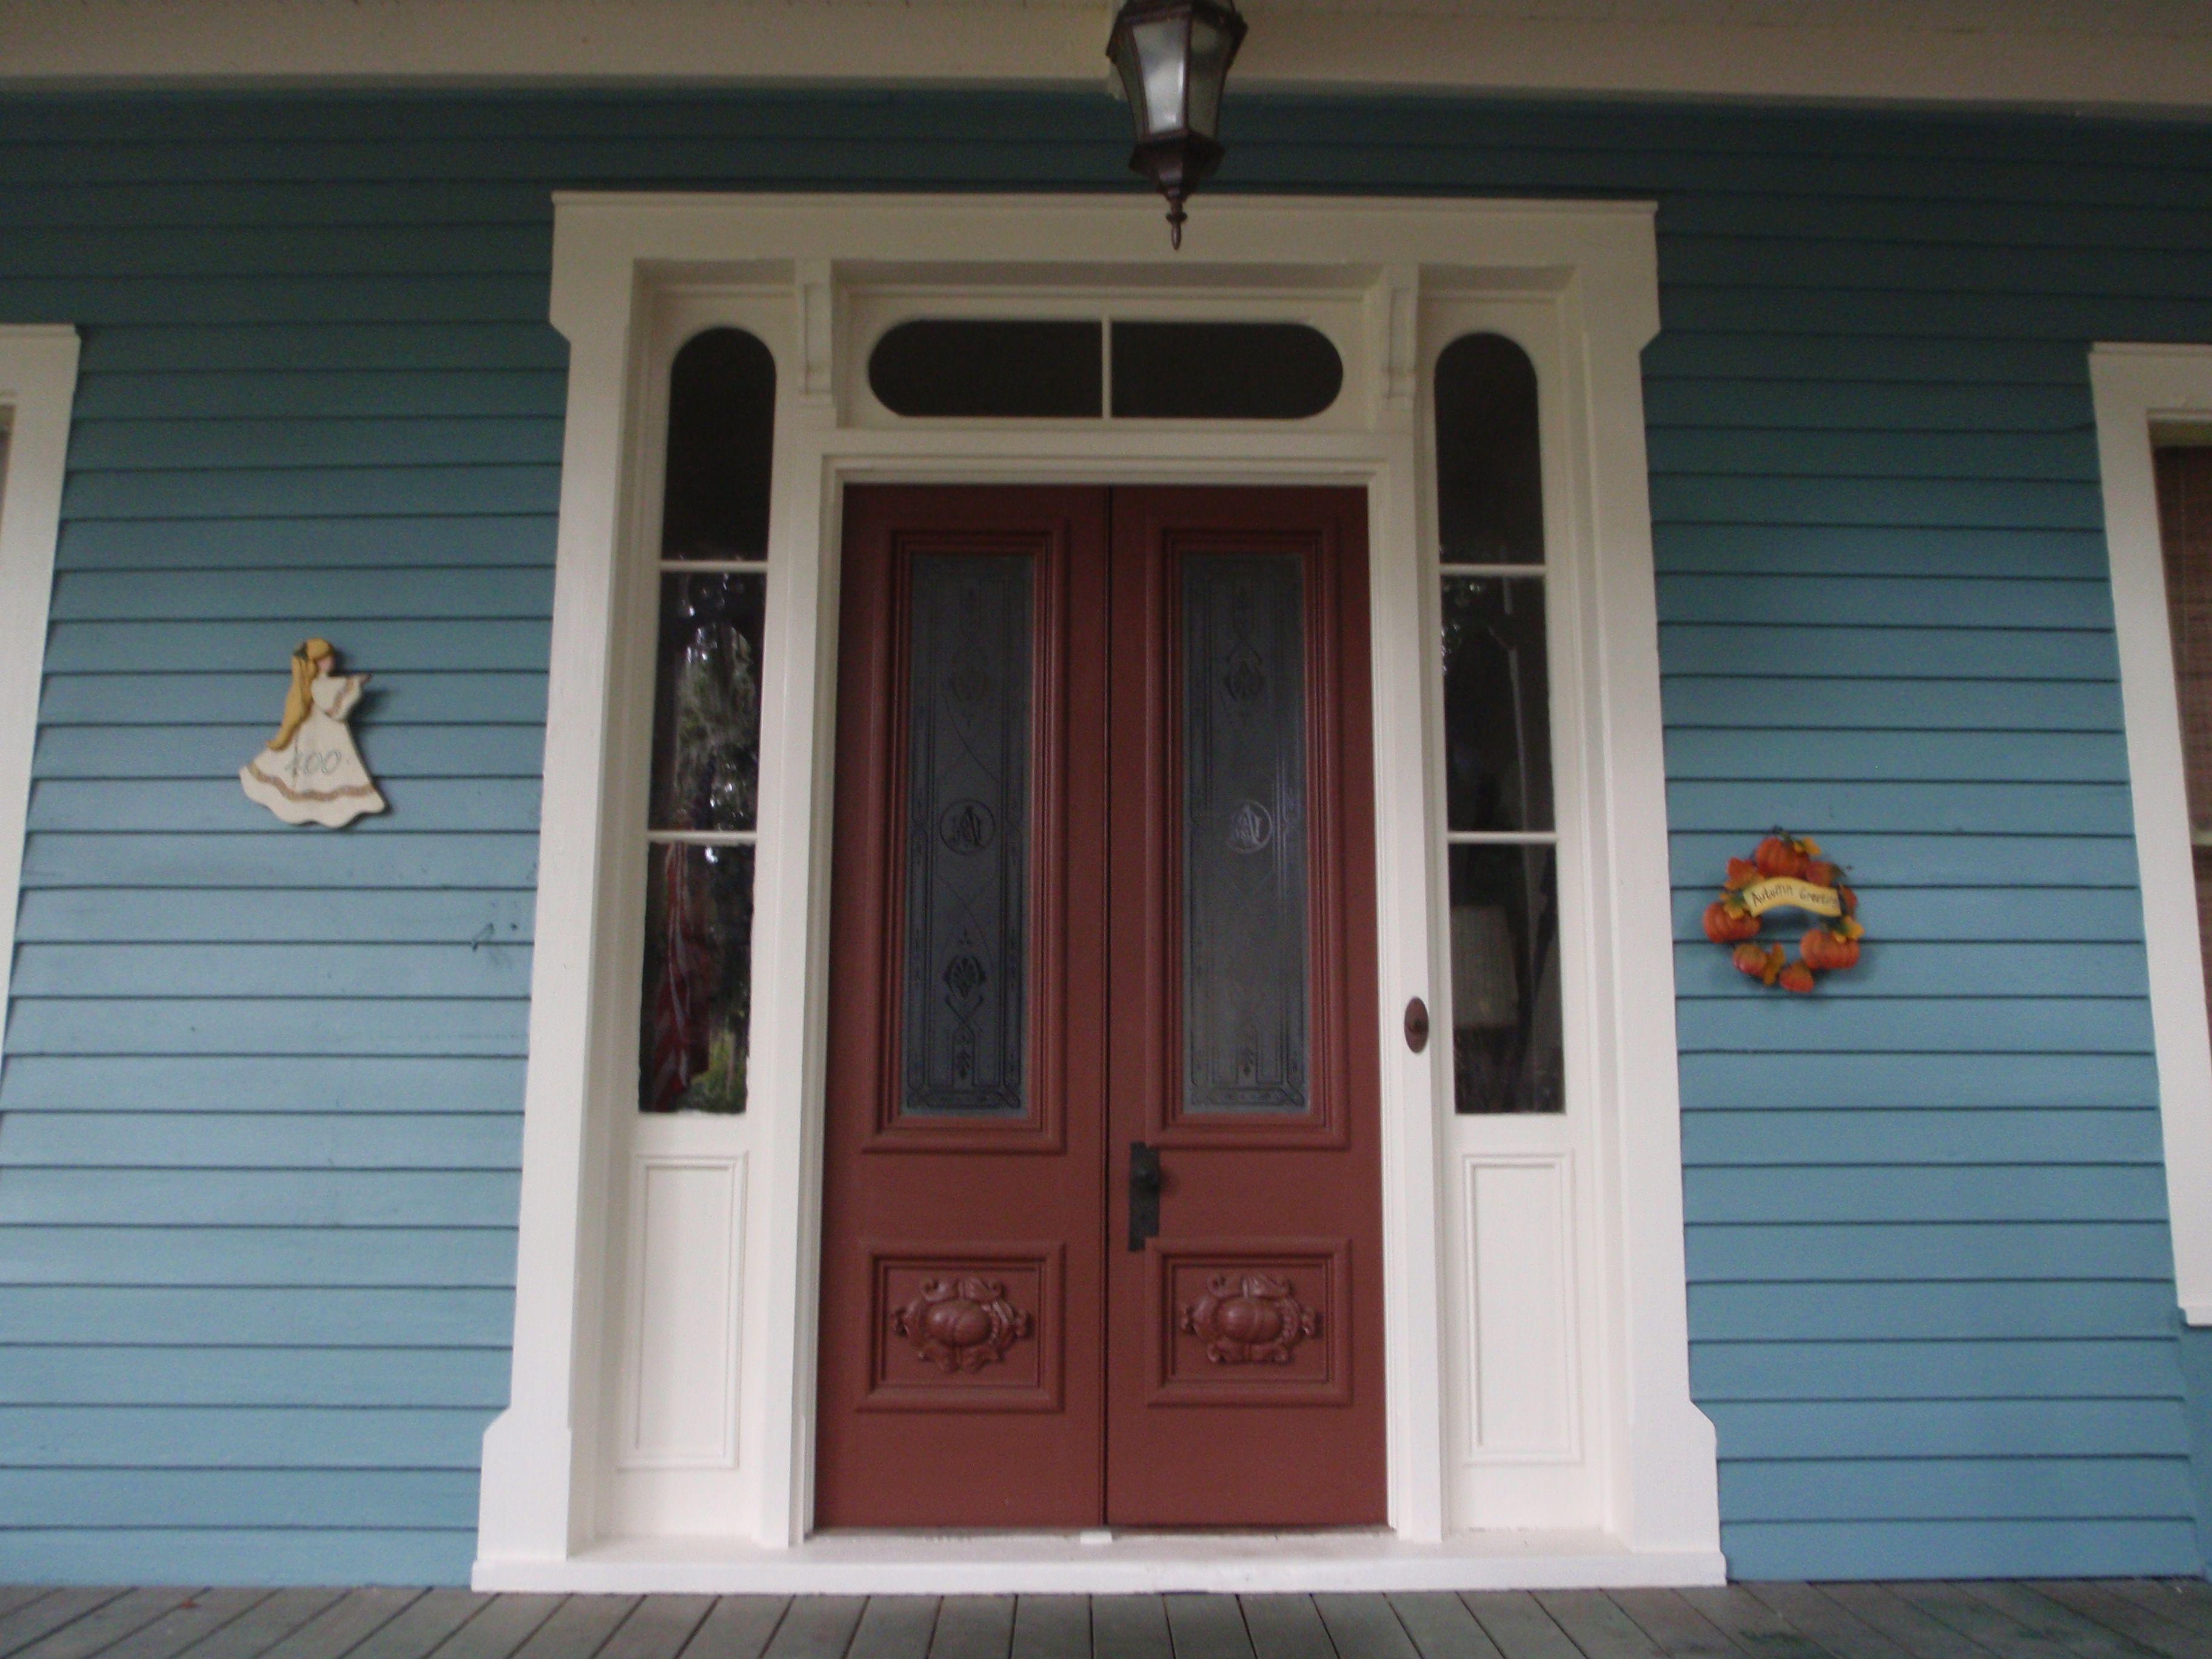 Enchanting white front door trim for double swing half glass brown